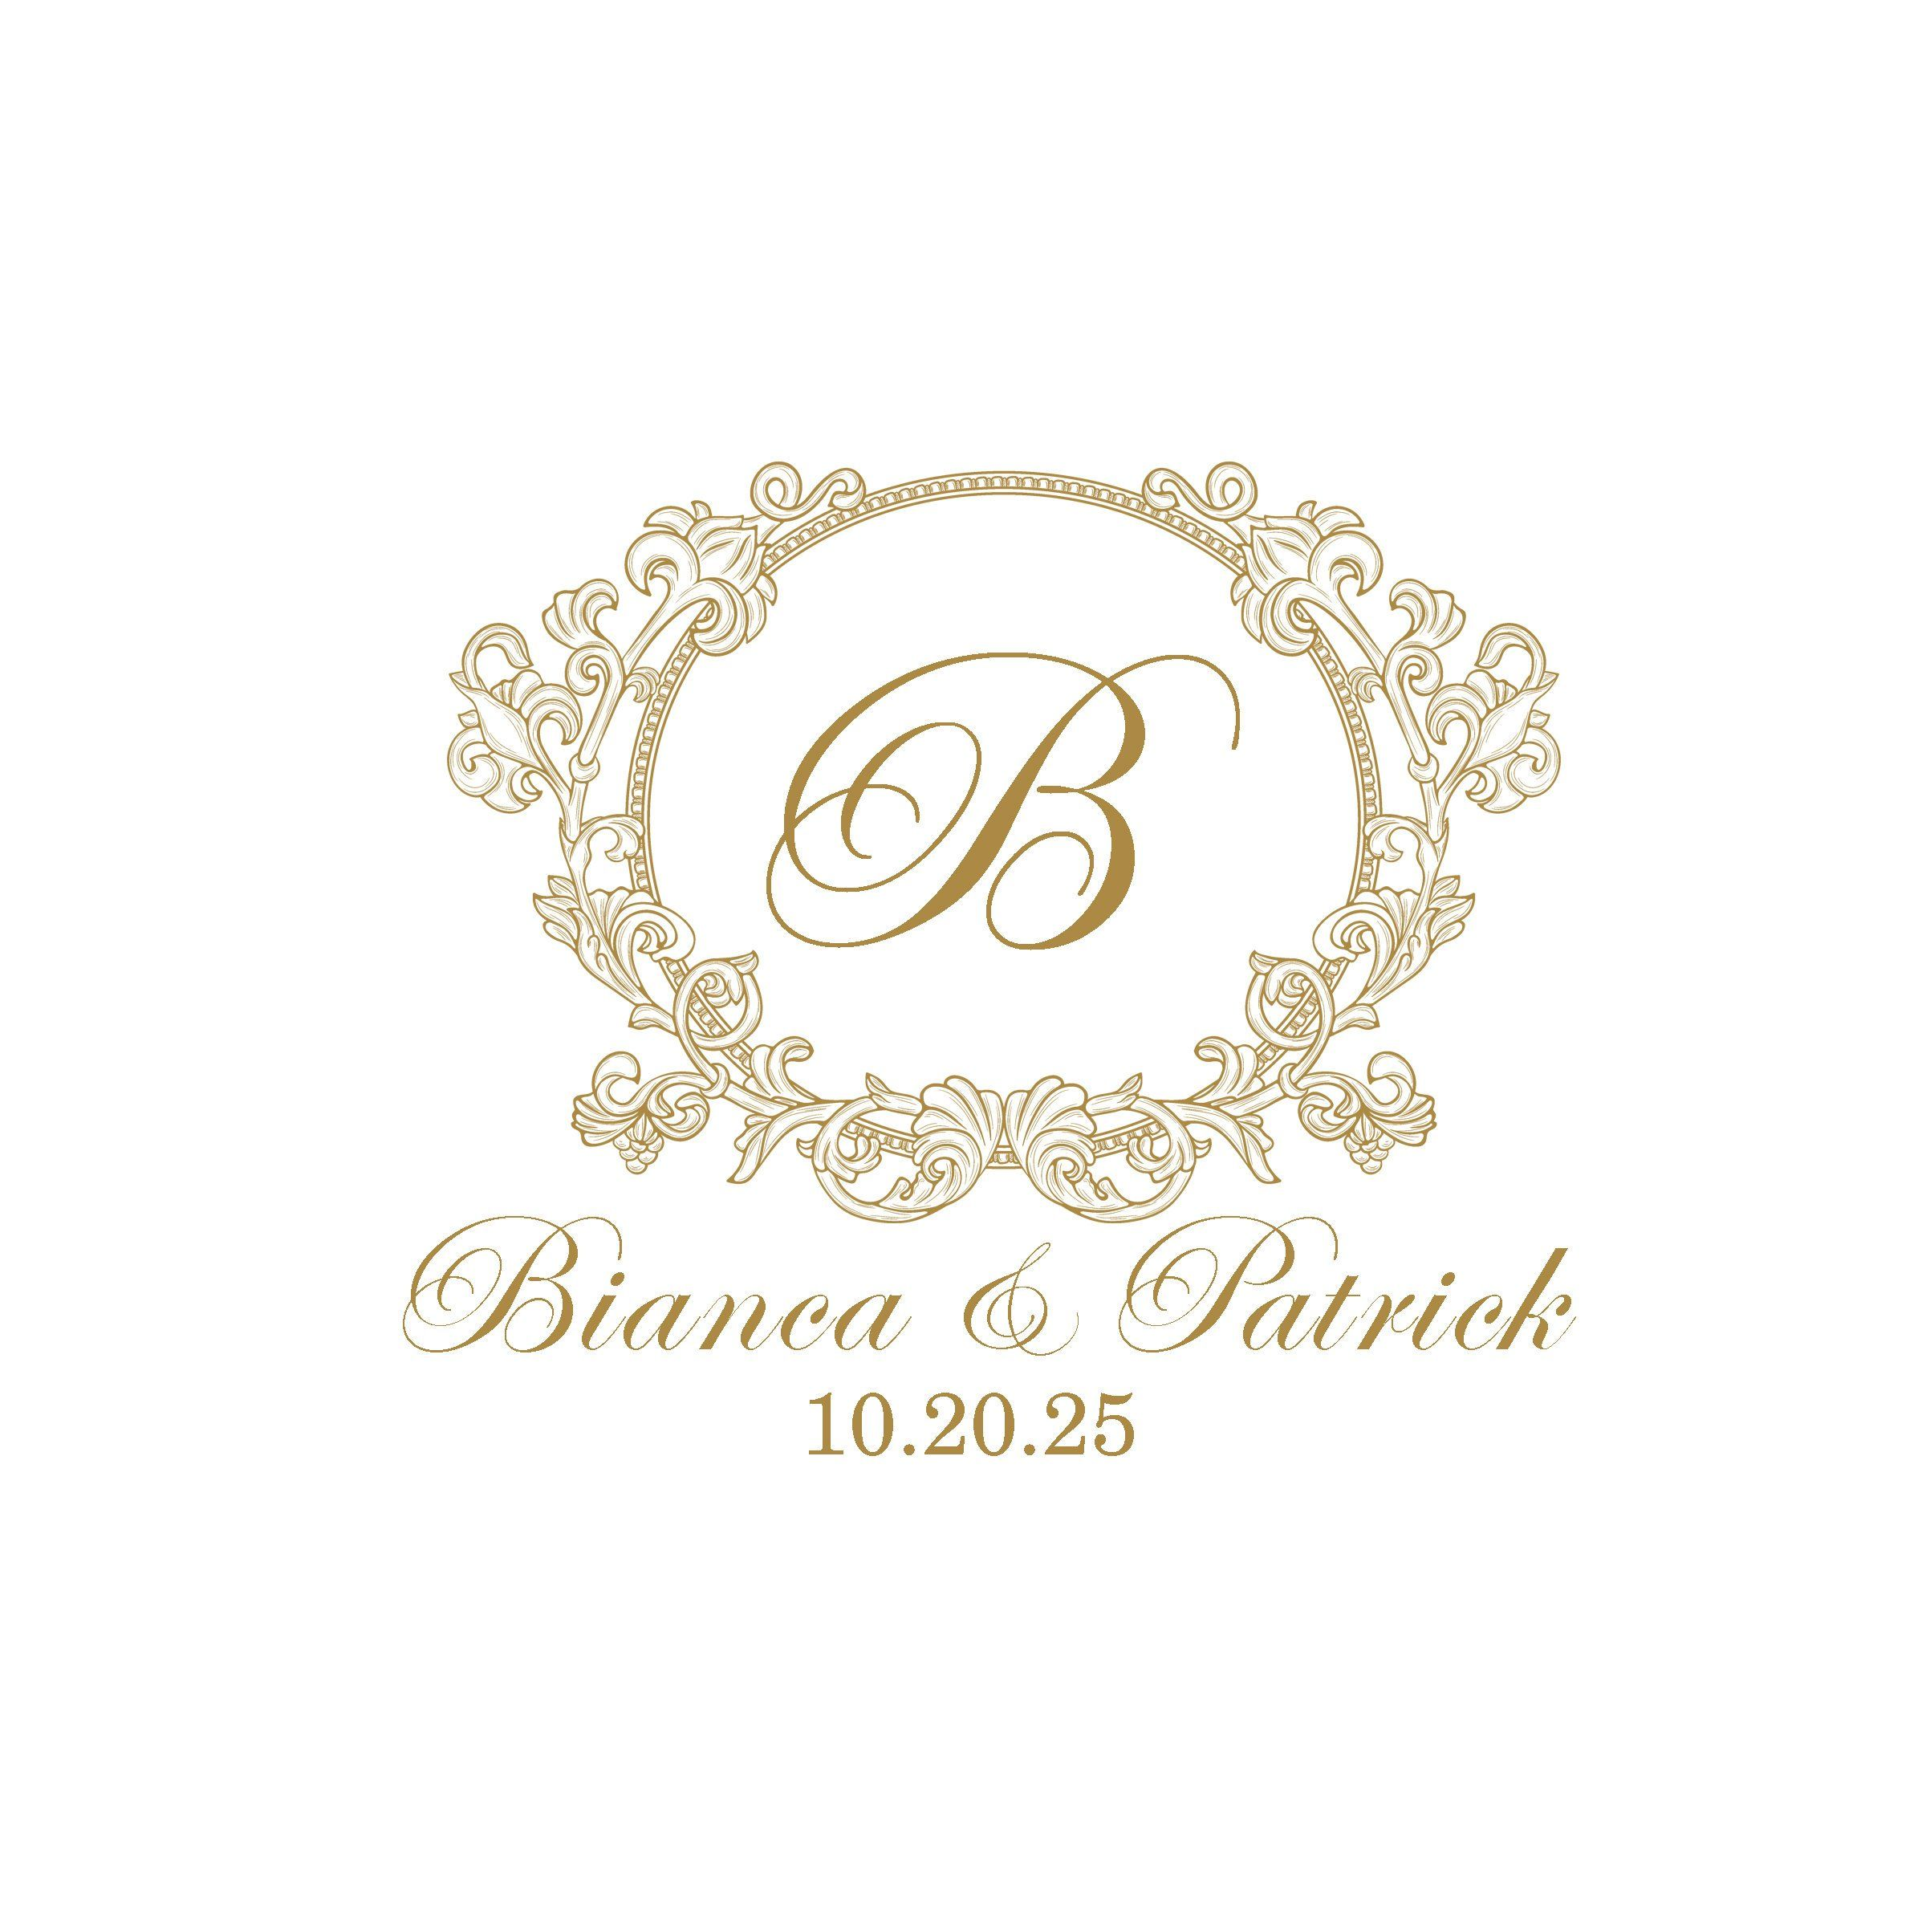 Wedding Logo 75 Digital Wedding Monogram Custom Wedding Etsy In 2020 Custom Wedding Monogram Wedding Logos Monogram Wedding